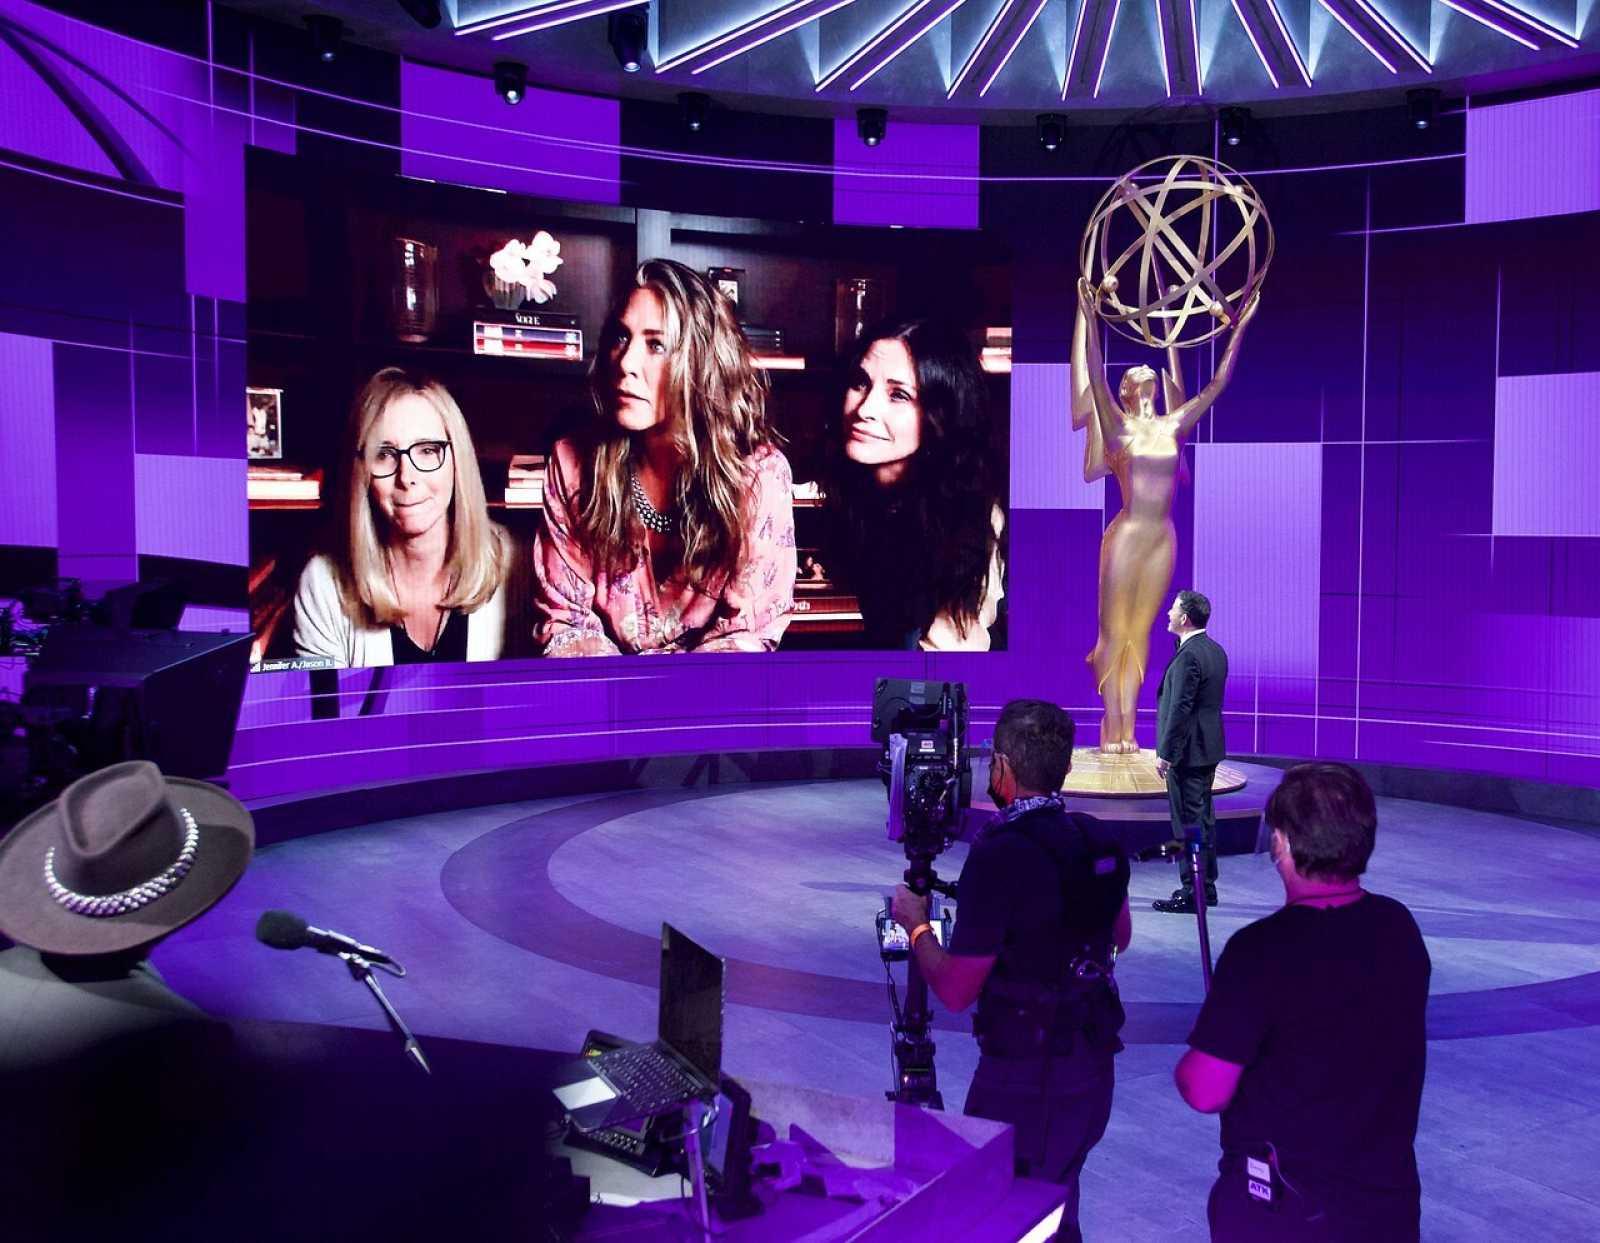 Jimmy Kimmel frente a una pantalla en la que se vea a Jennifer Aniston, Lisa Kudrow y Courteney Cox